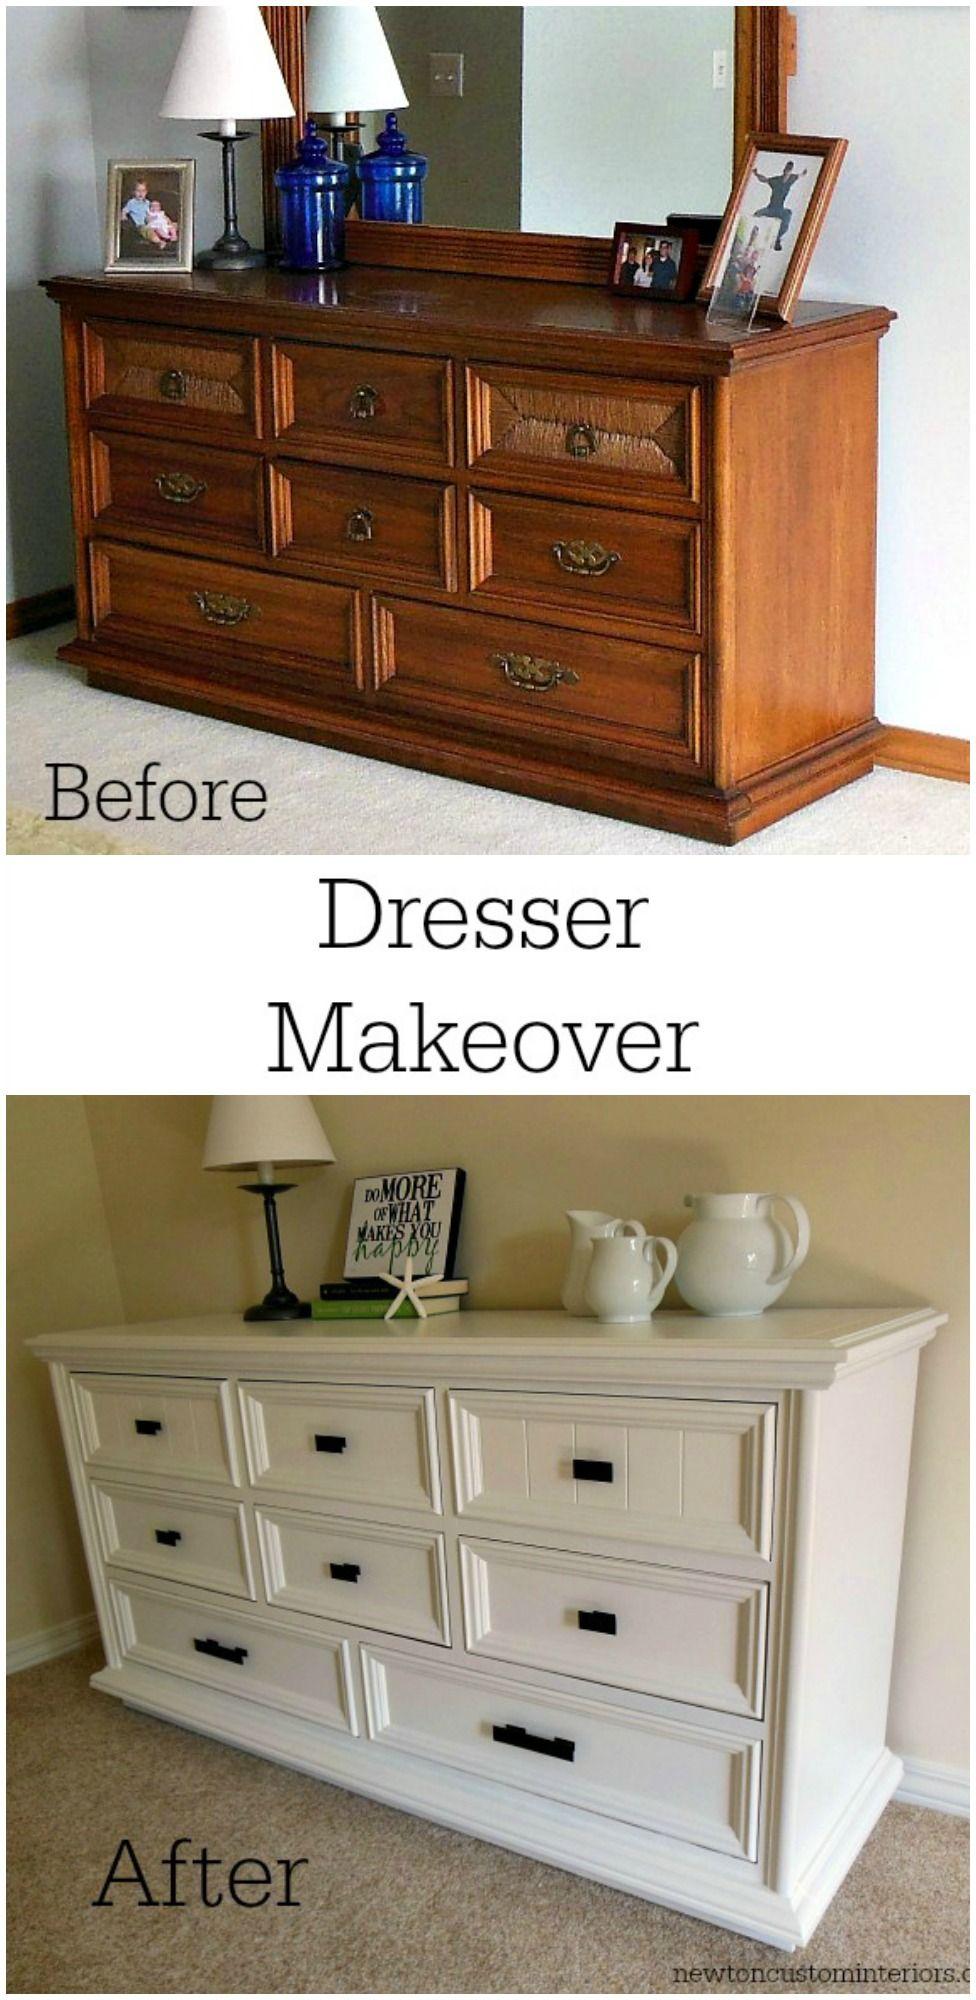 Dresser Makeover Repurposed furniture, Diy furniture